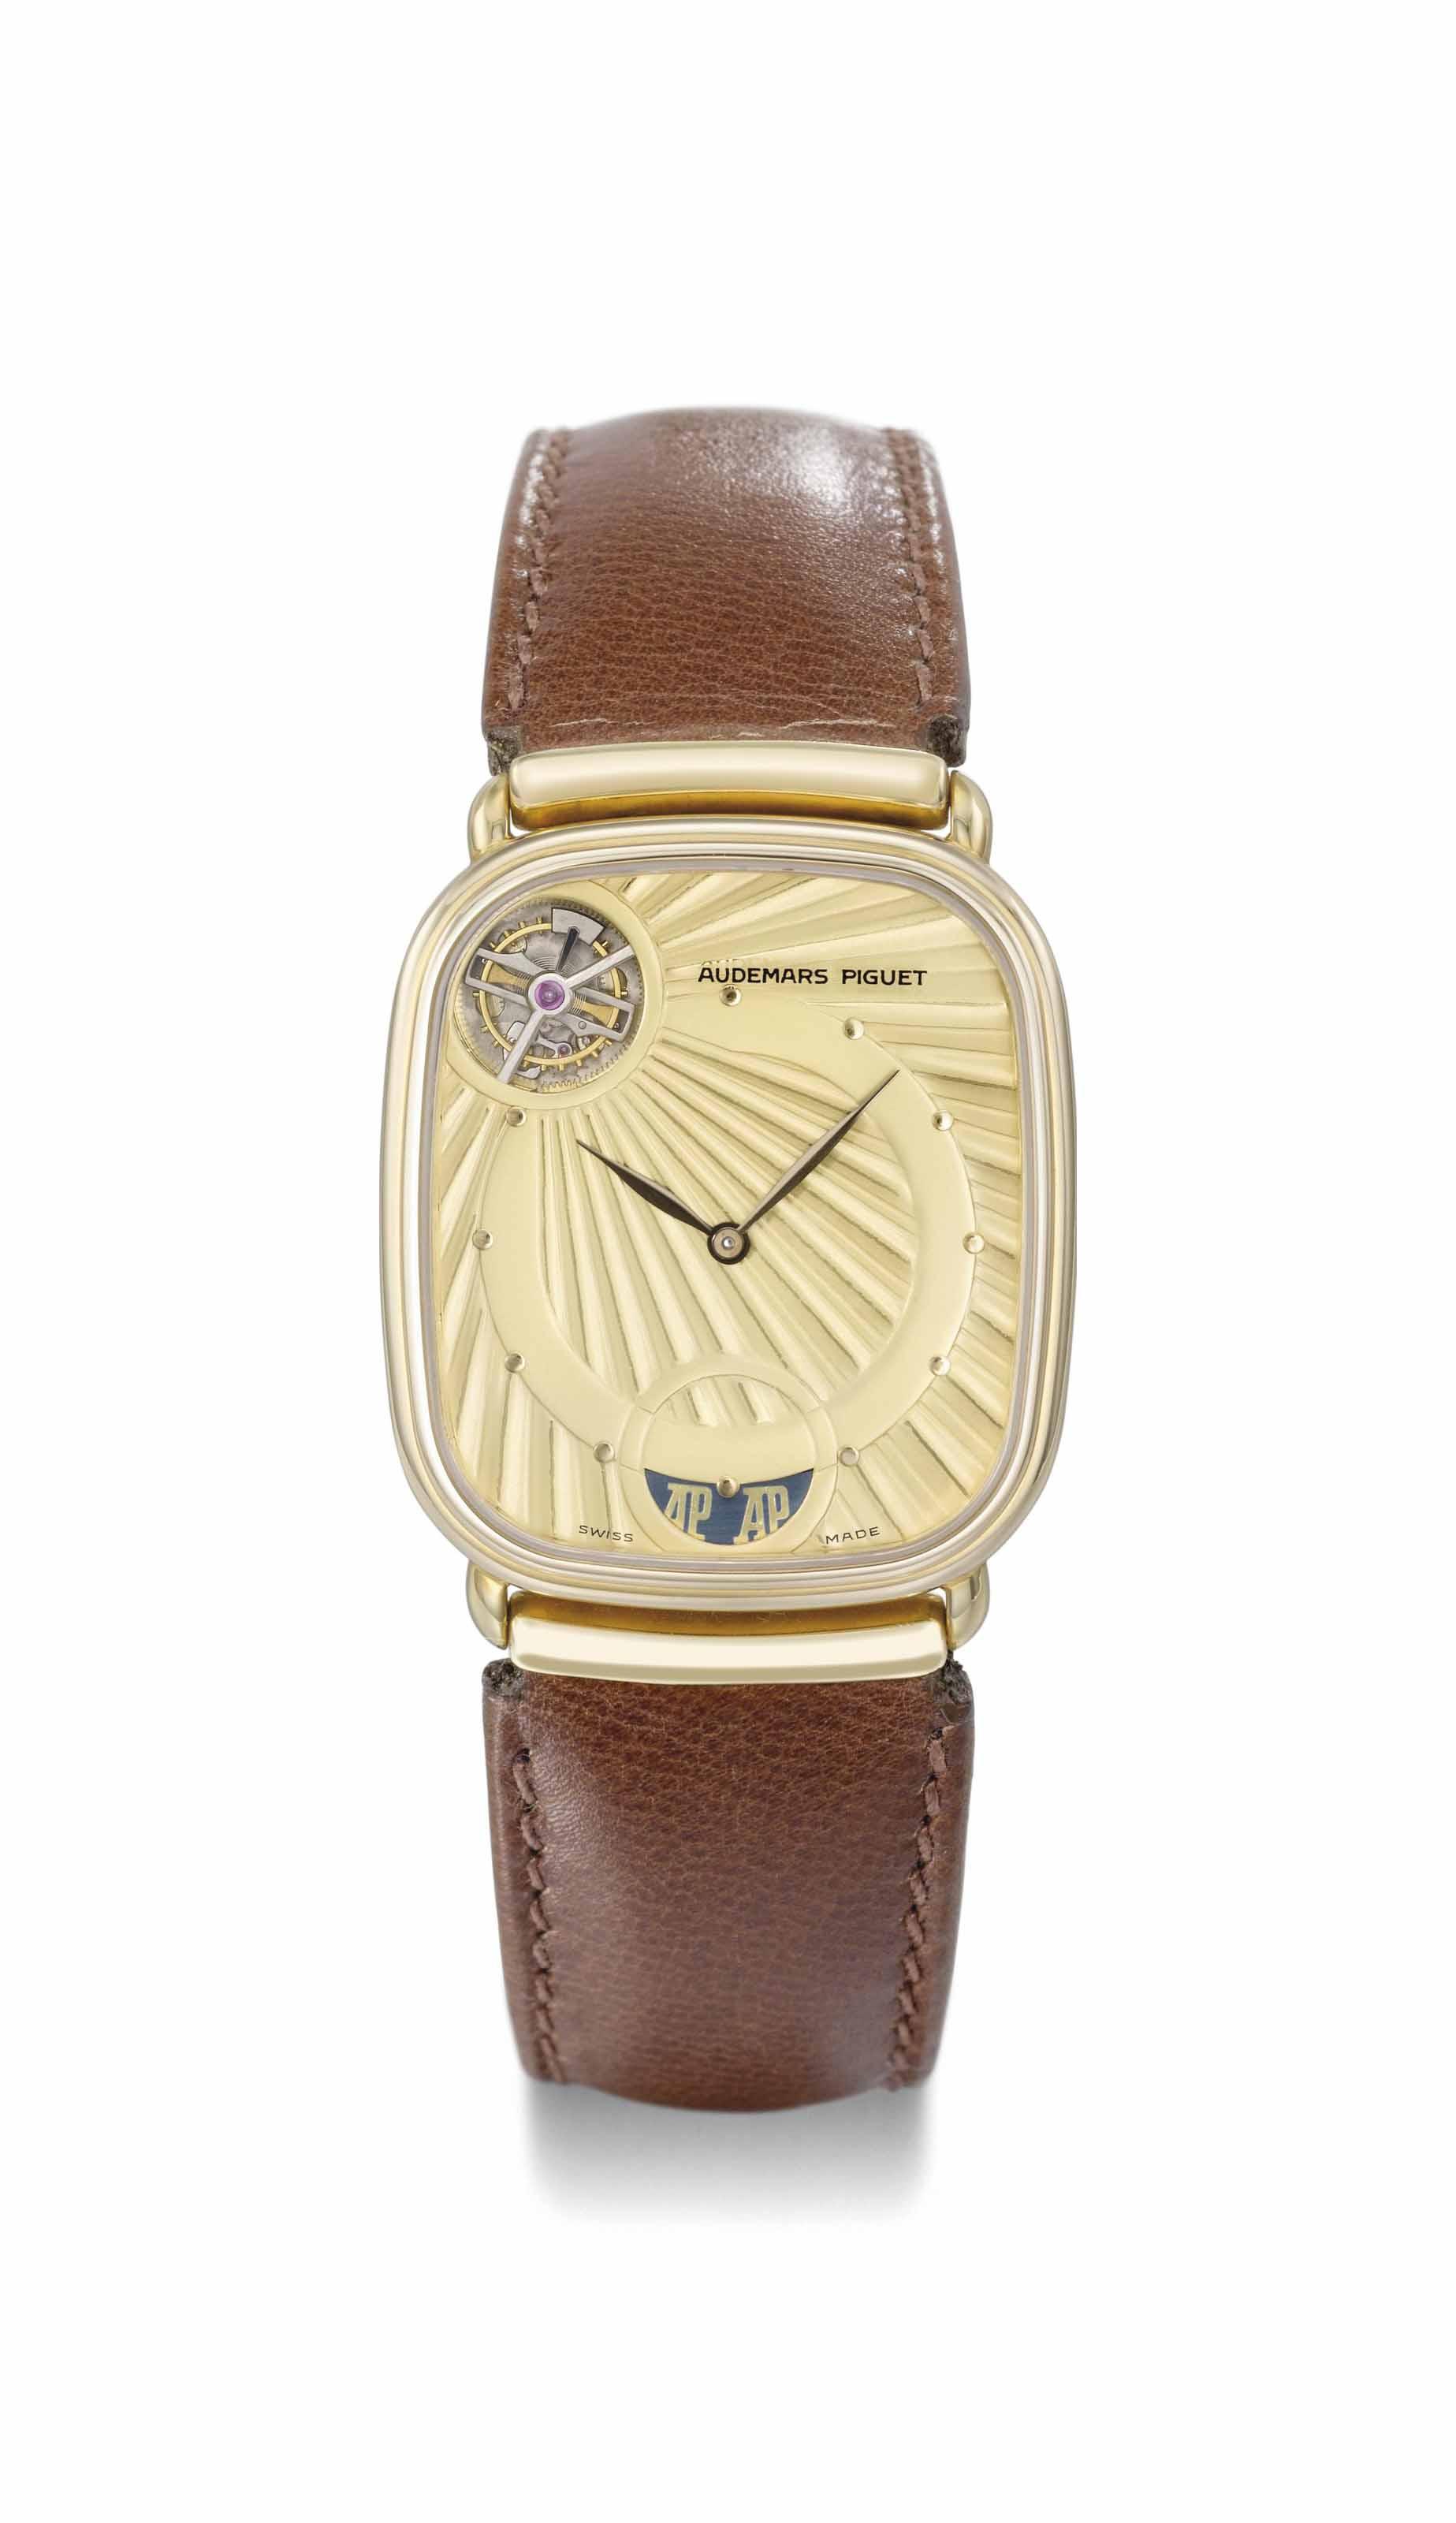 Audemars Piguet. A fine 18K gold thin automatic tourbillon wristwatch